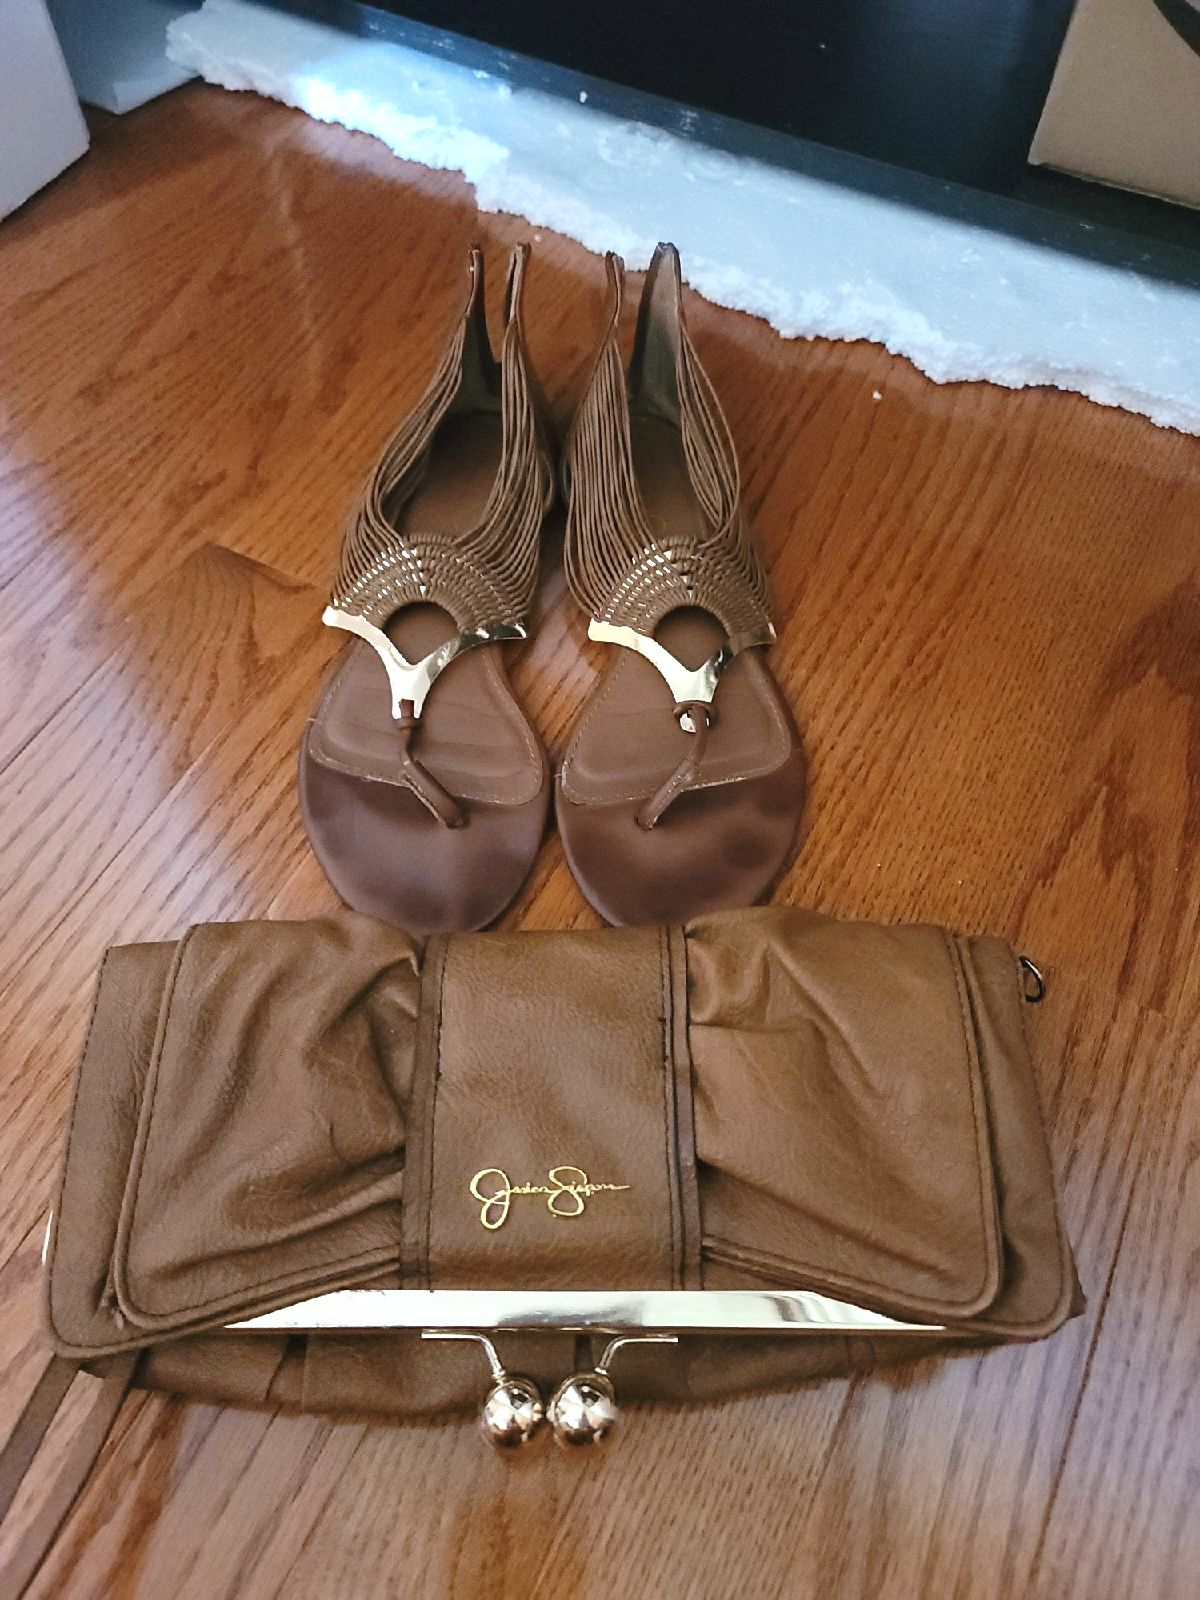 Aldo Zipper Sandals + Jessica Simpson Cl